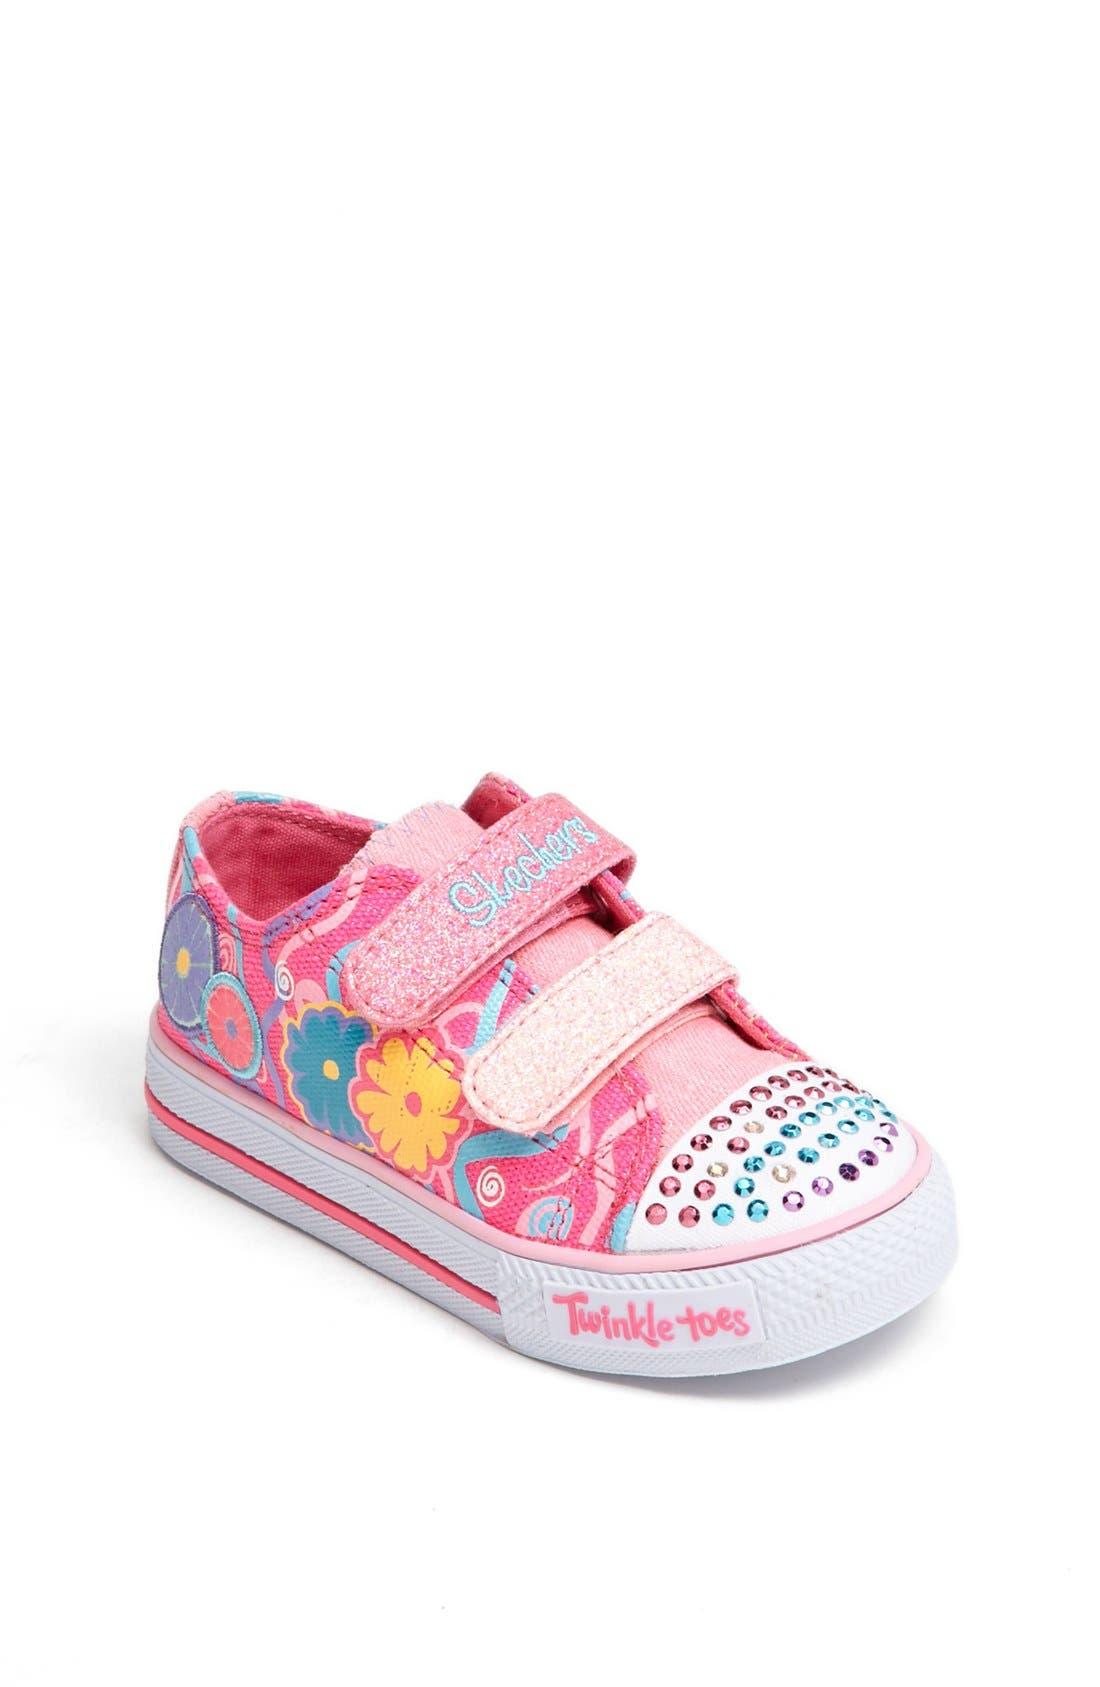 Alternate Image 1 Selected - SKECHERS 'Twinkle Toes - Sweet Talk' Light-Up Sneaker (Walker & Toddler)